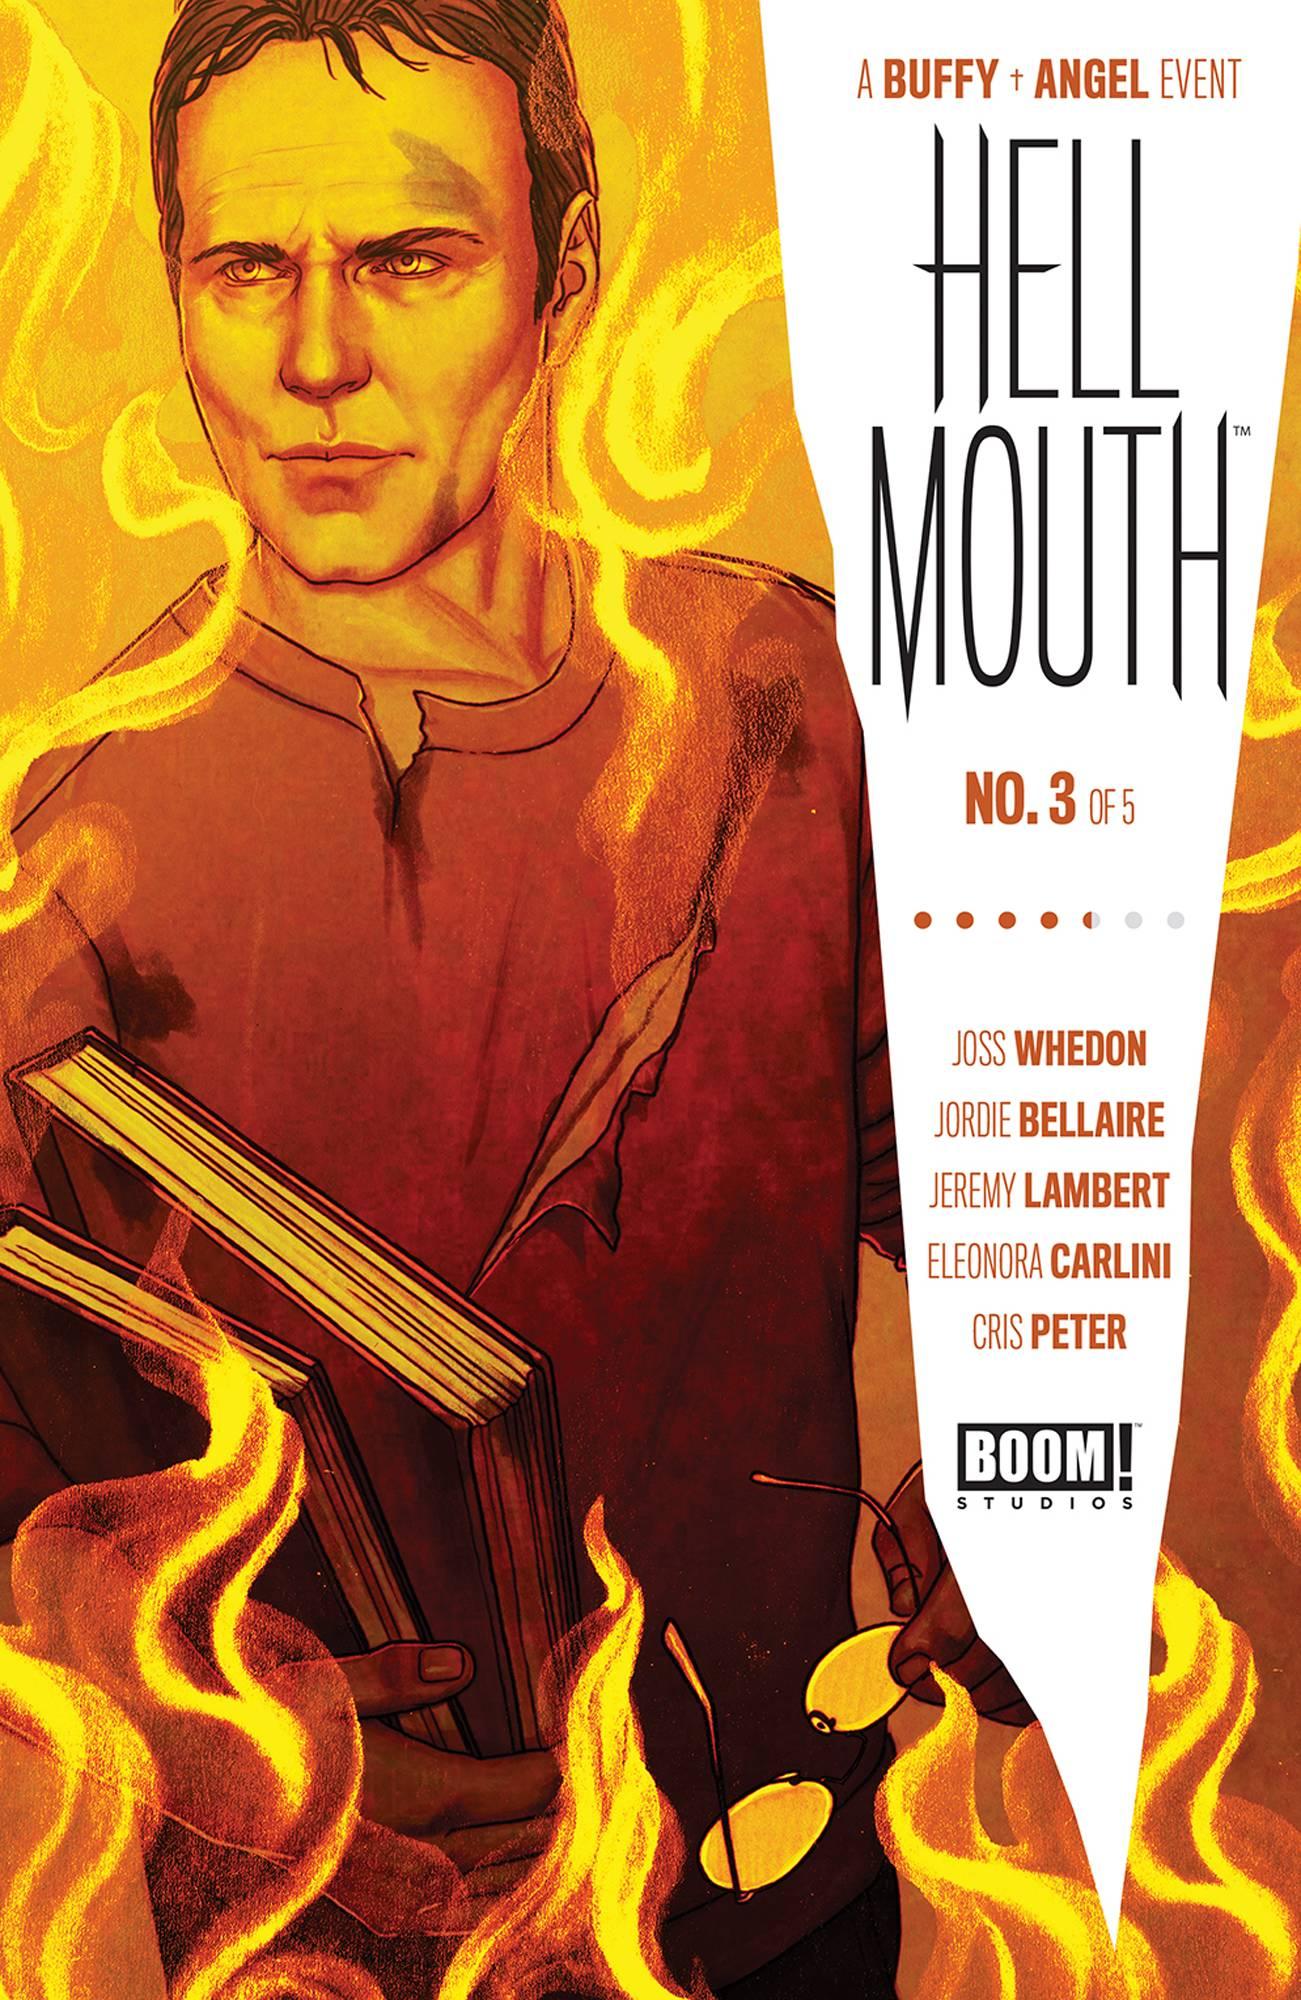 Buffy Vampire Slayer: Angel - Hellmouth #3 (2019)